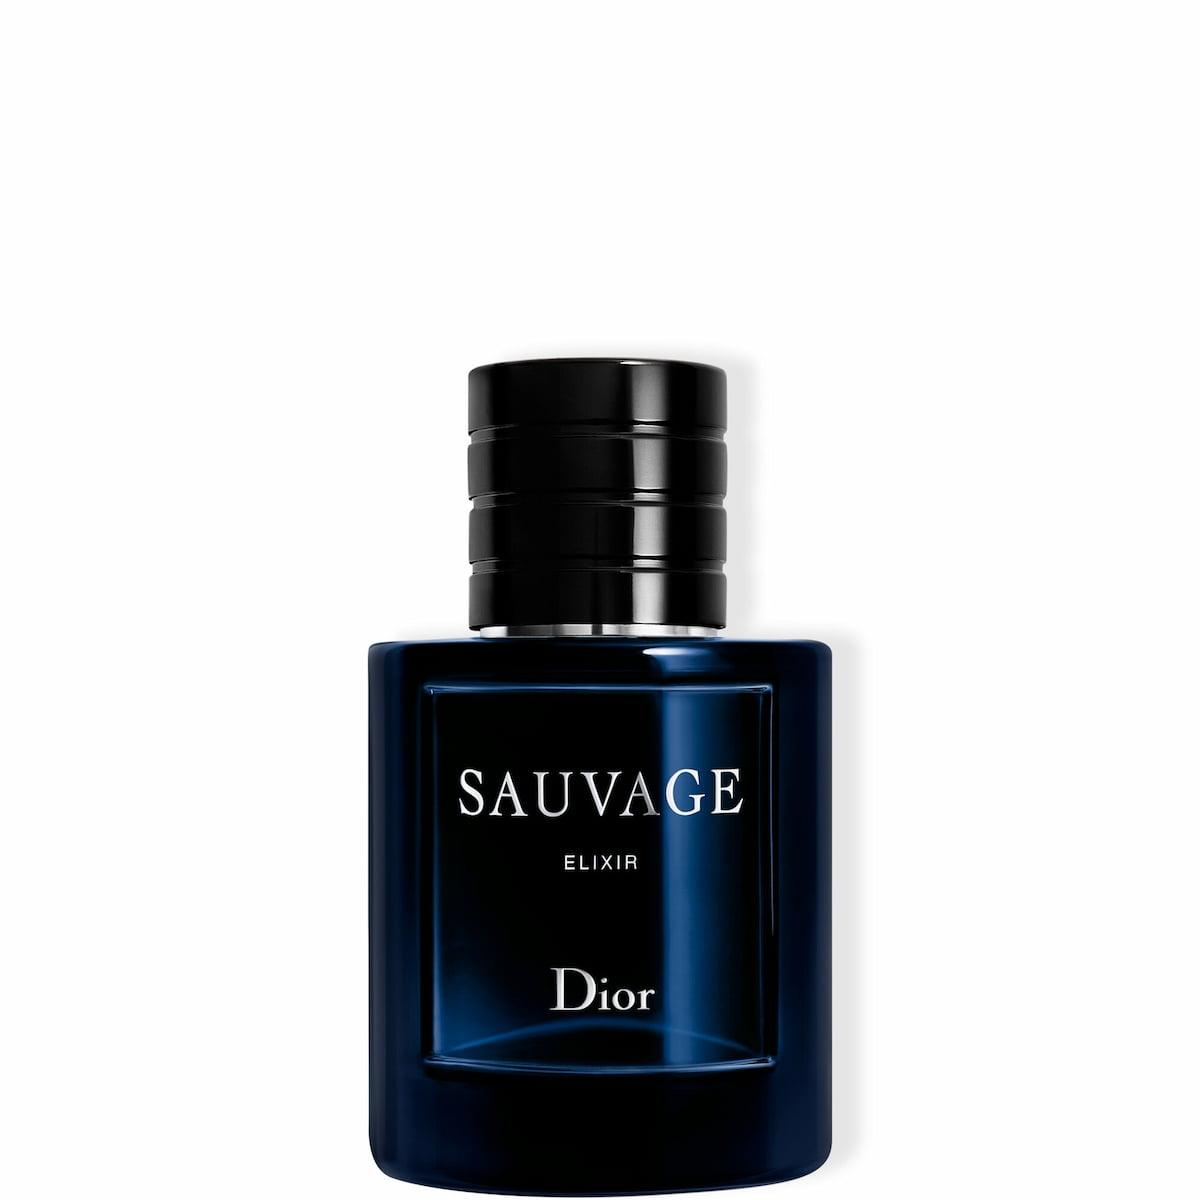 Dior Sauvage Elixir Parfum